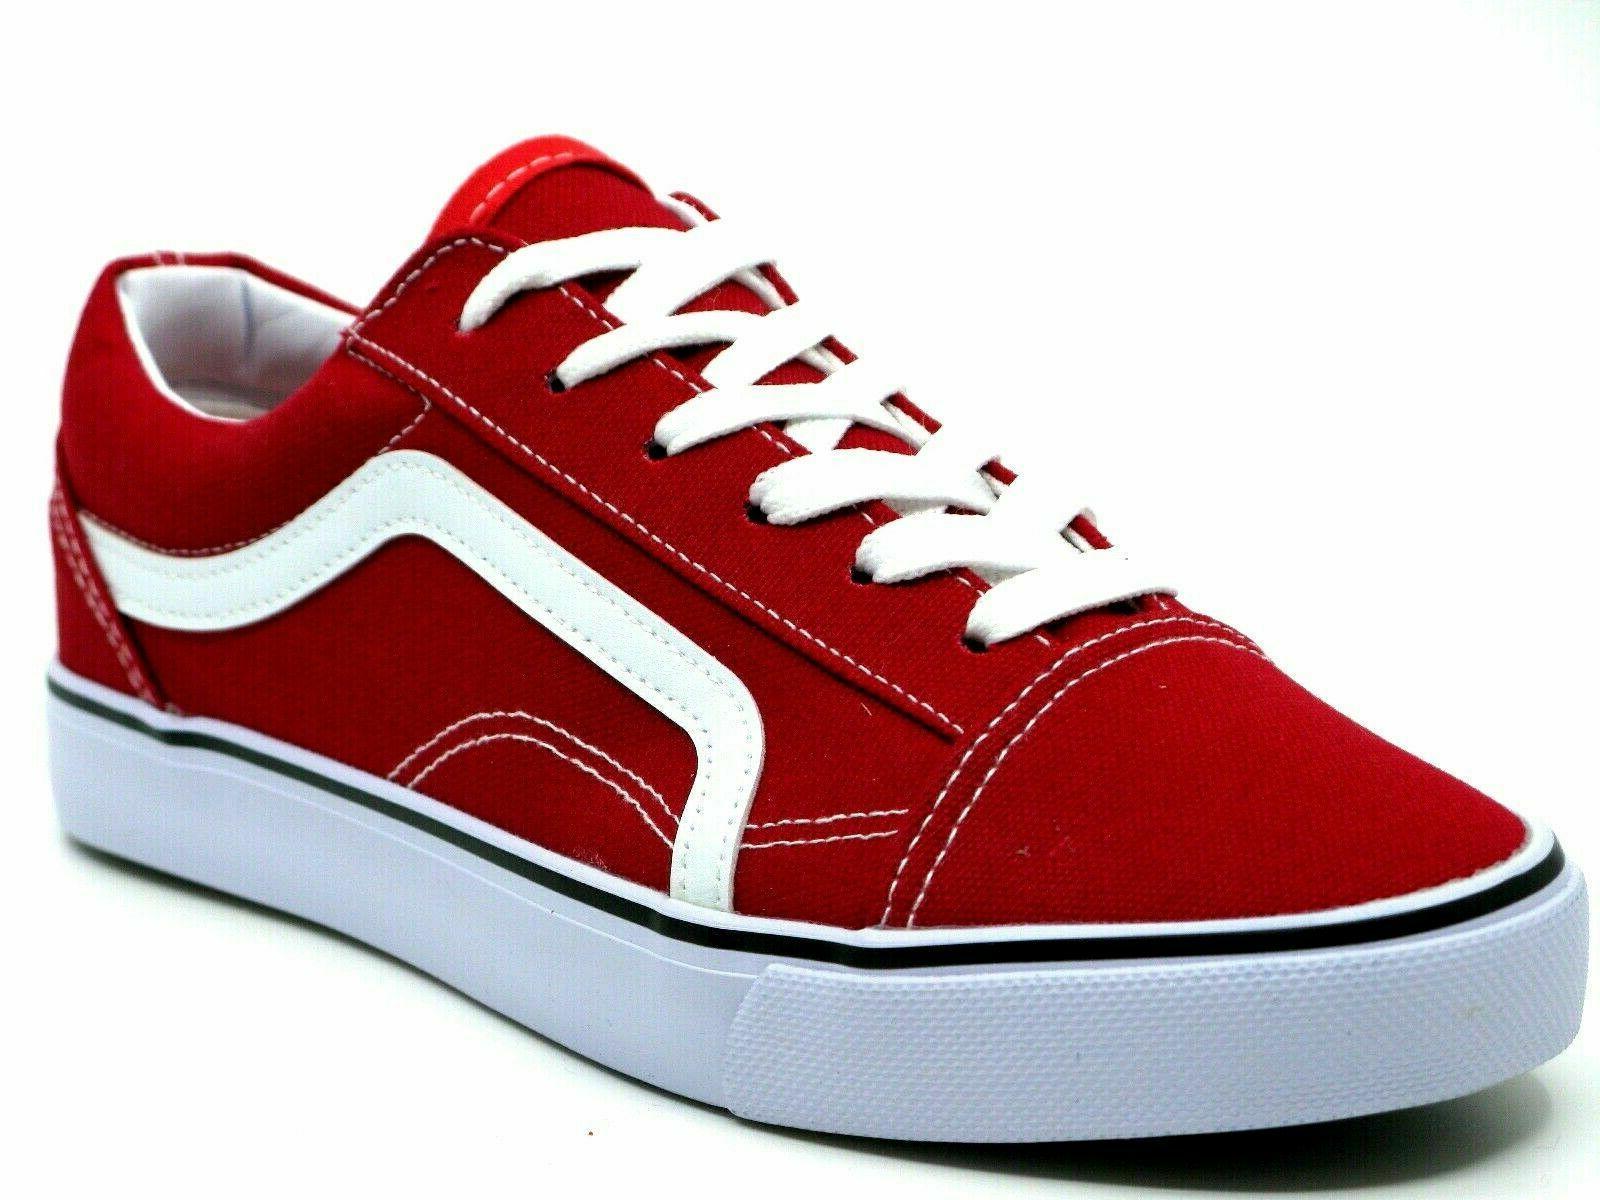 Men's Canvas Athletic Sneakers